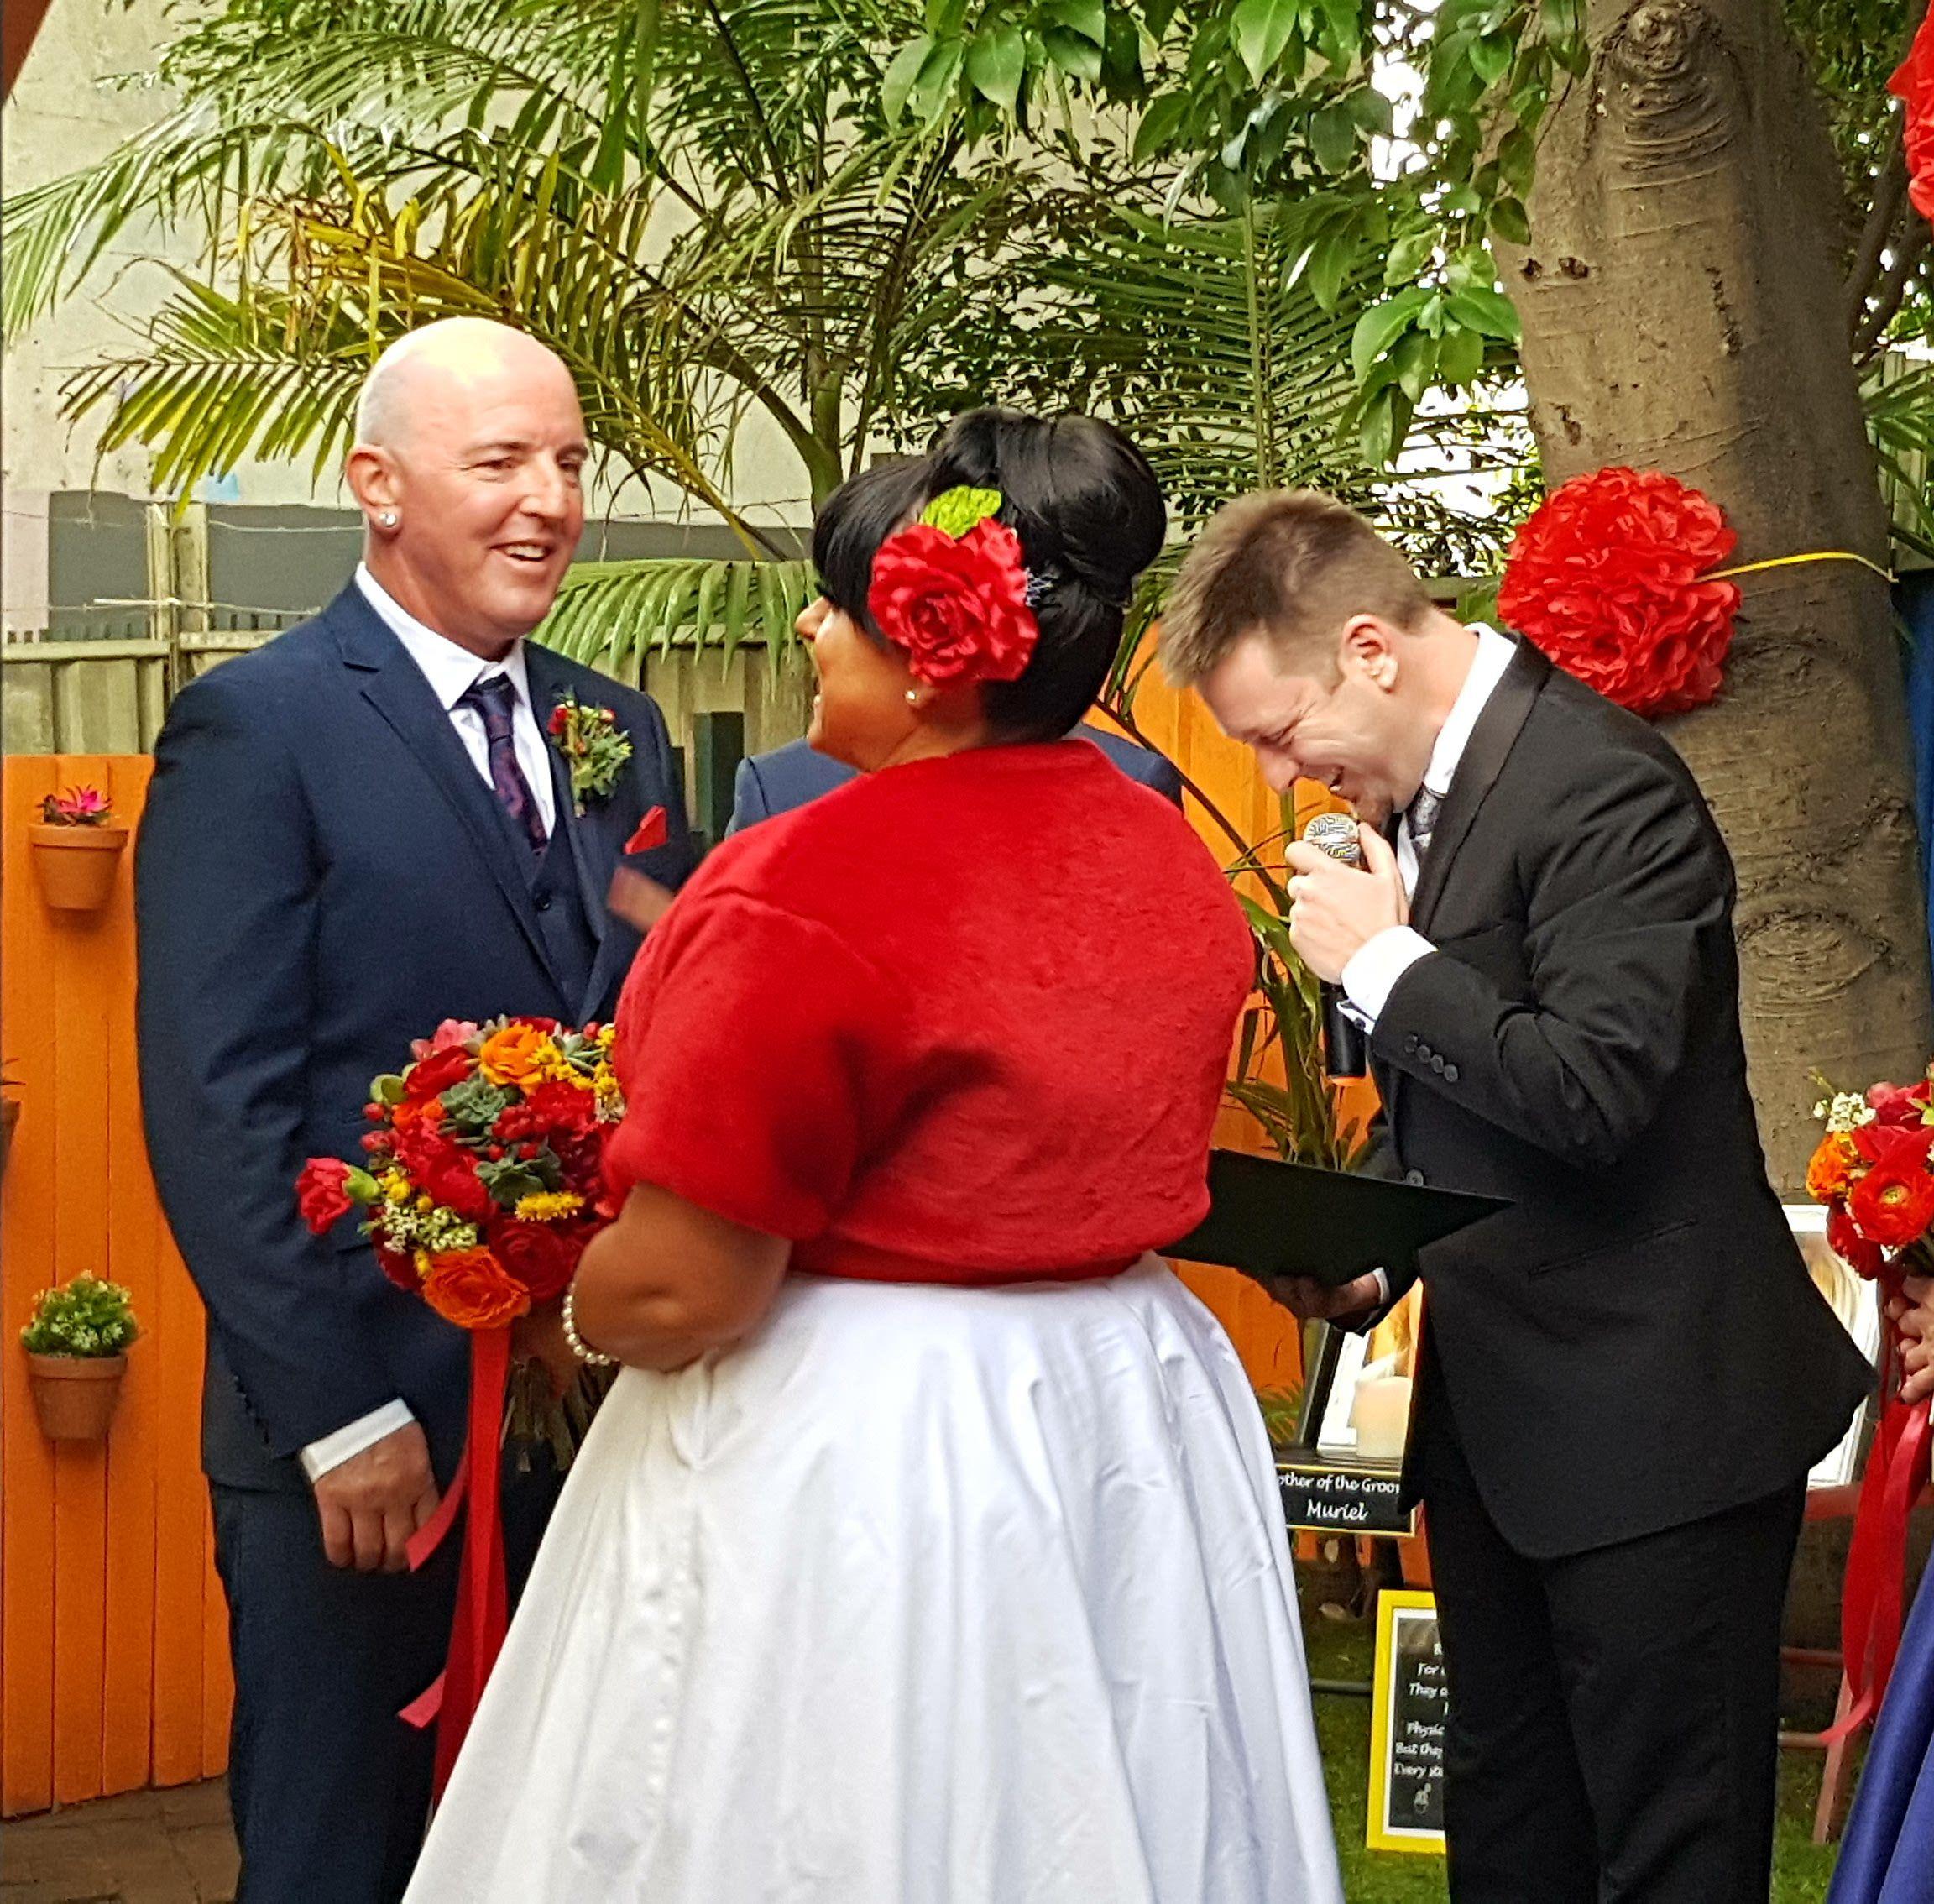 Fun Wedding Ceremony, Fun Celebrant, Marriage Celebrant, Themed wedding ceremony, customised wedding Ceremony, Fun male Celebrant, Sydney Celebrant